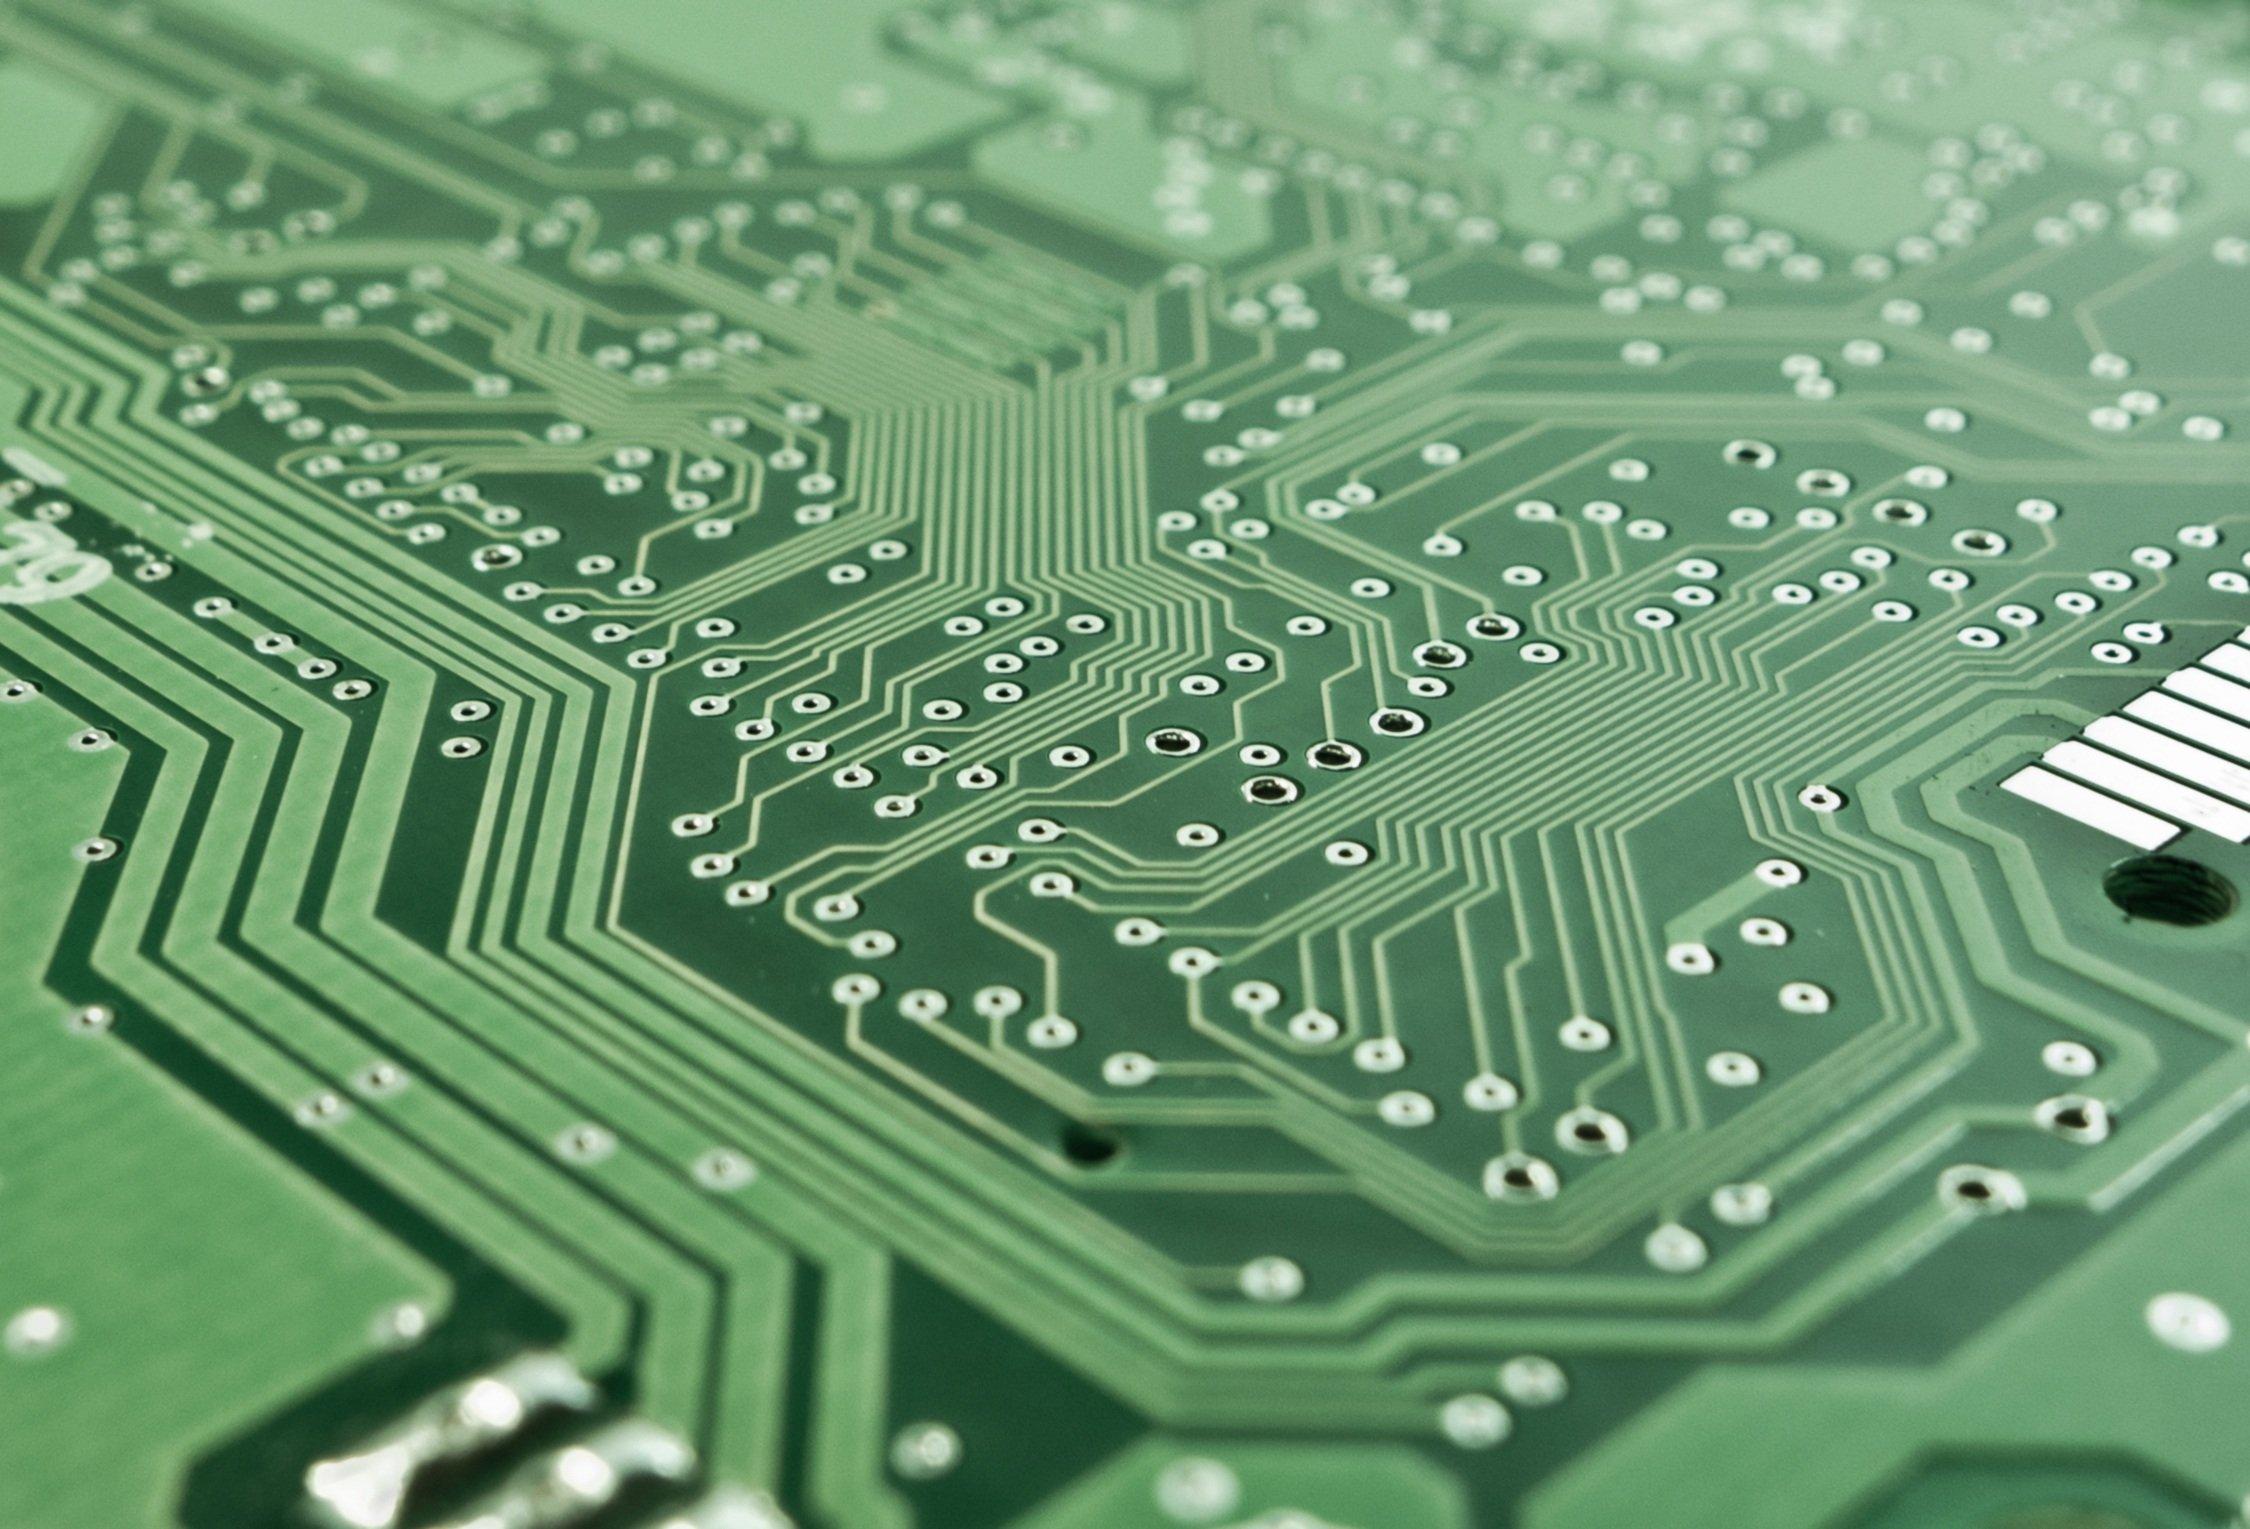 電子工作の回路基板